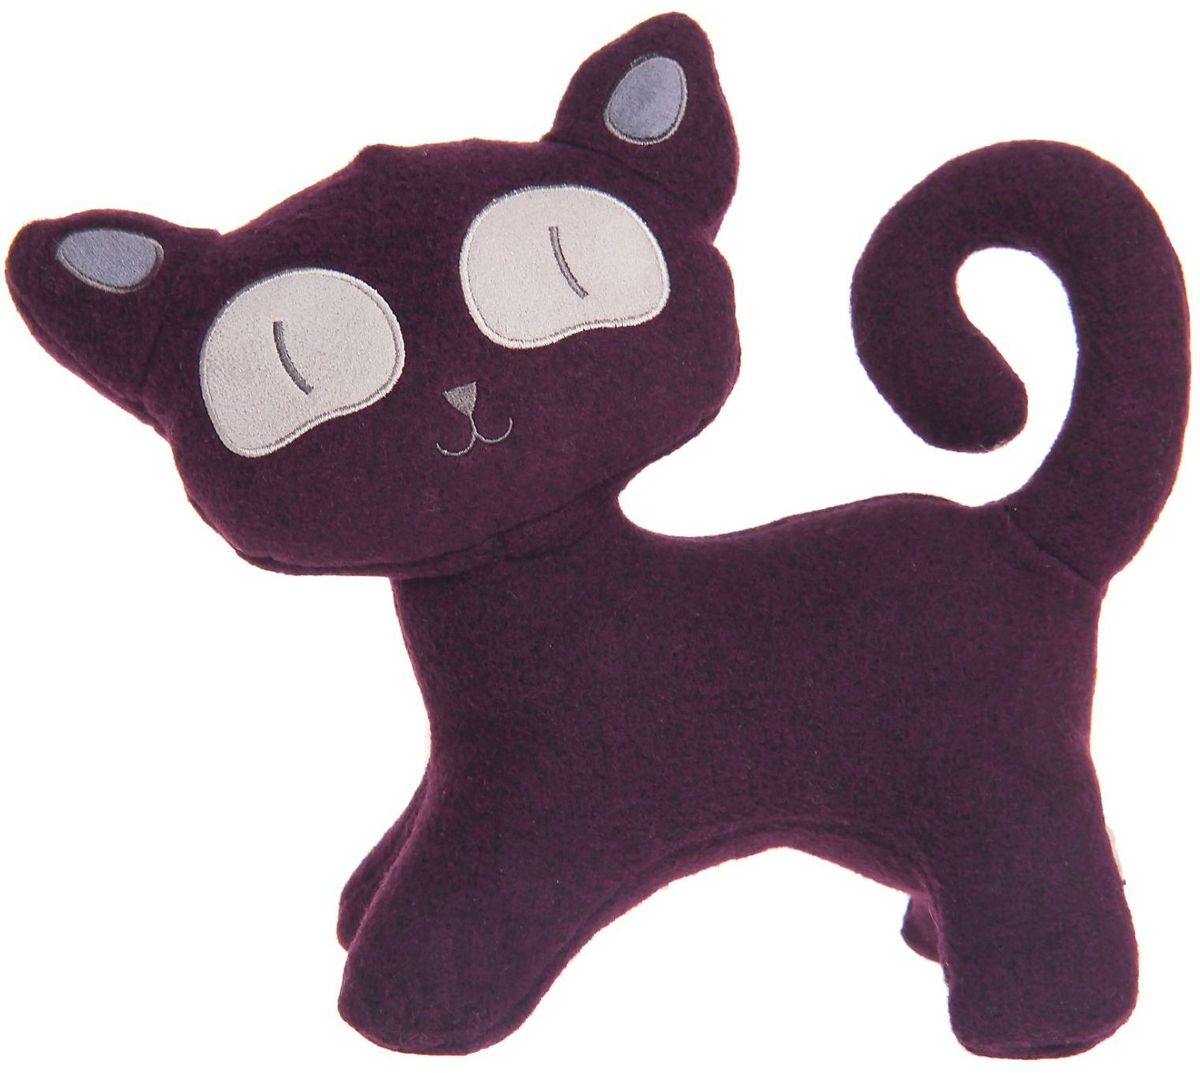 Купить Gund Мягкая игрушка Кошка Hasumi 25, 5 см 2245504, Сима-ленд, Мягкие игрушки